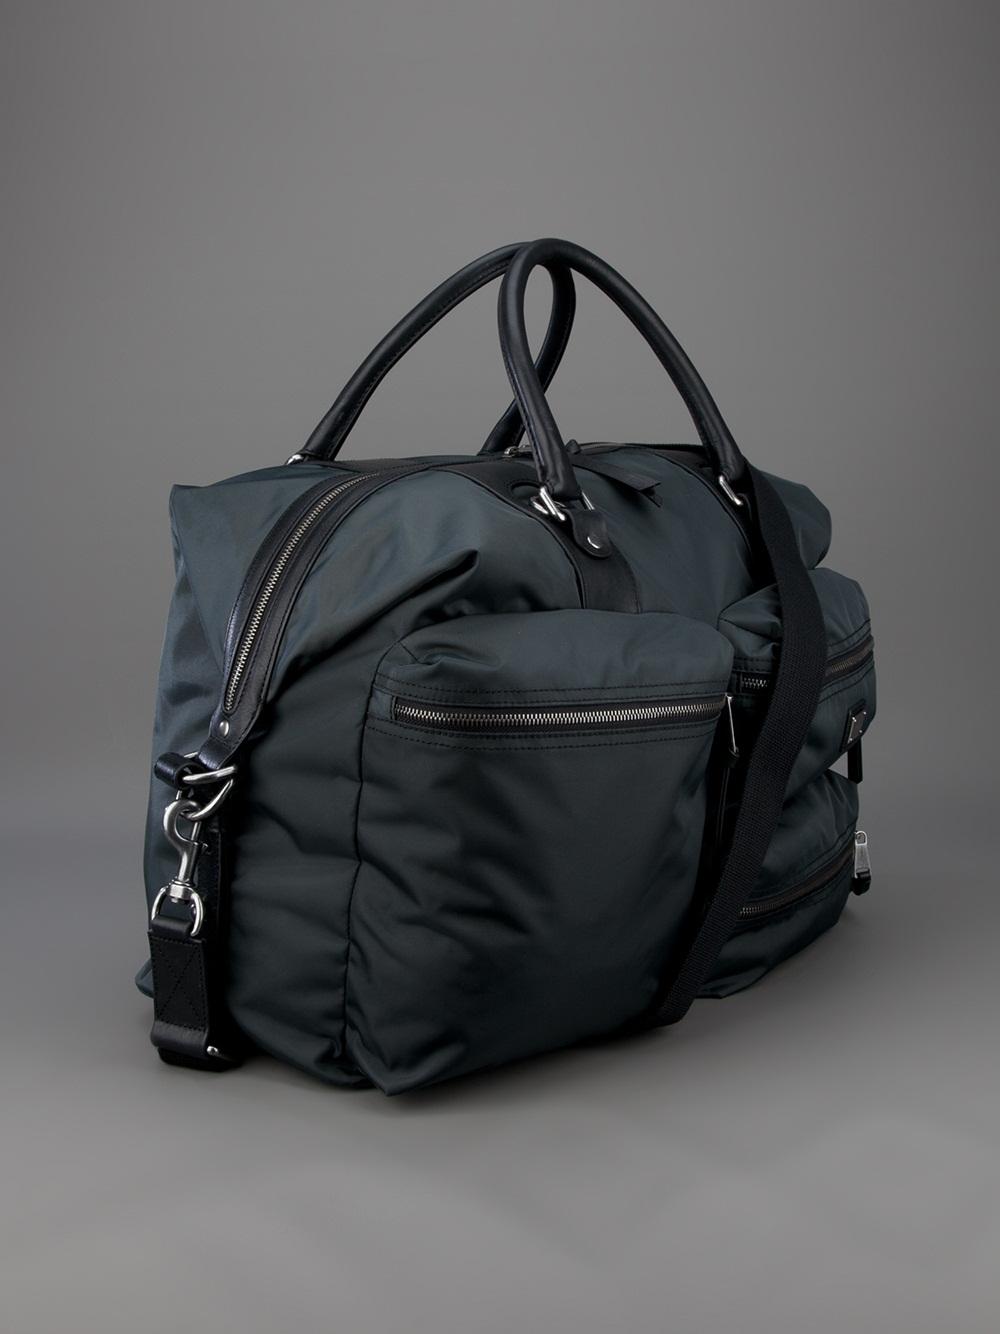 8d56573585 Lyst - Dolce   Gabbana Pocketed Travel Bag in Gray for Men